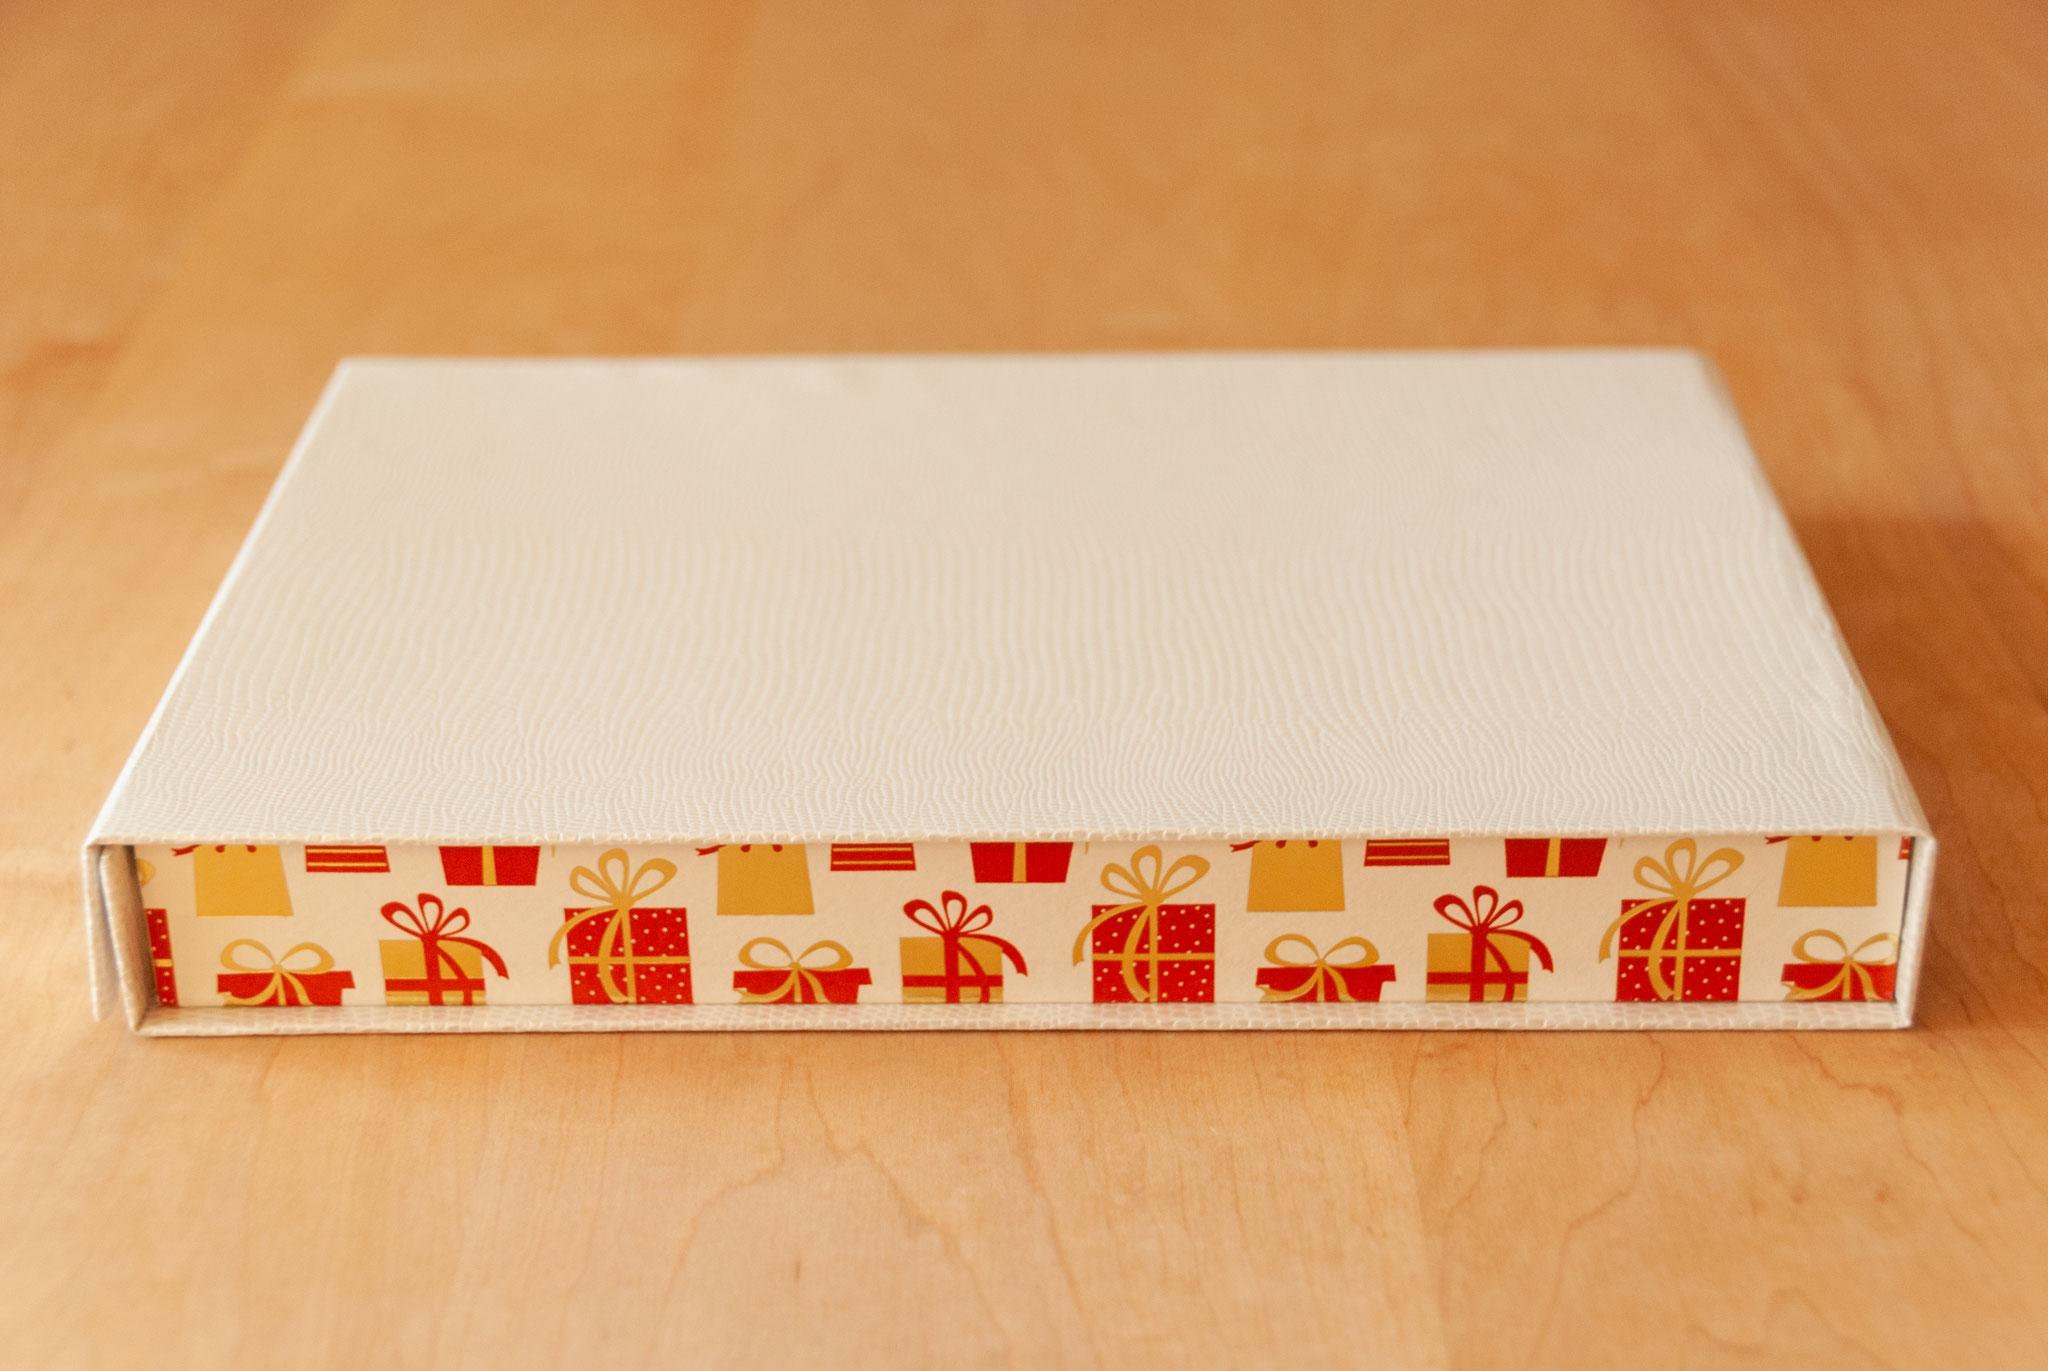 A5 box, with magnet, Fleur*Fleur*, fleurfleur